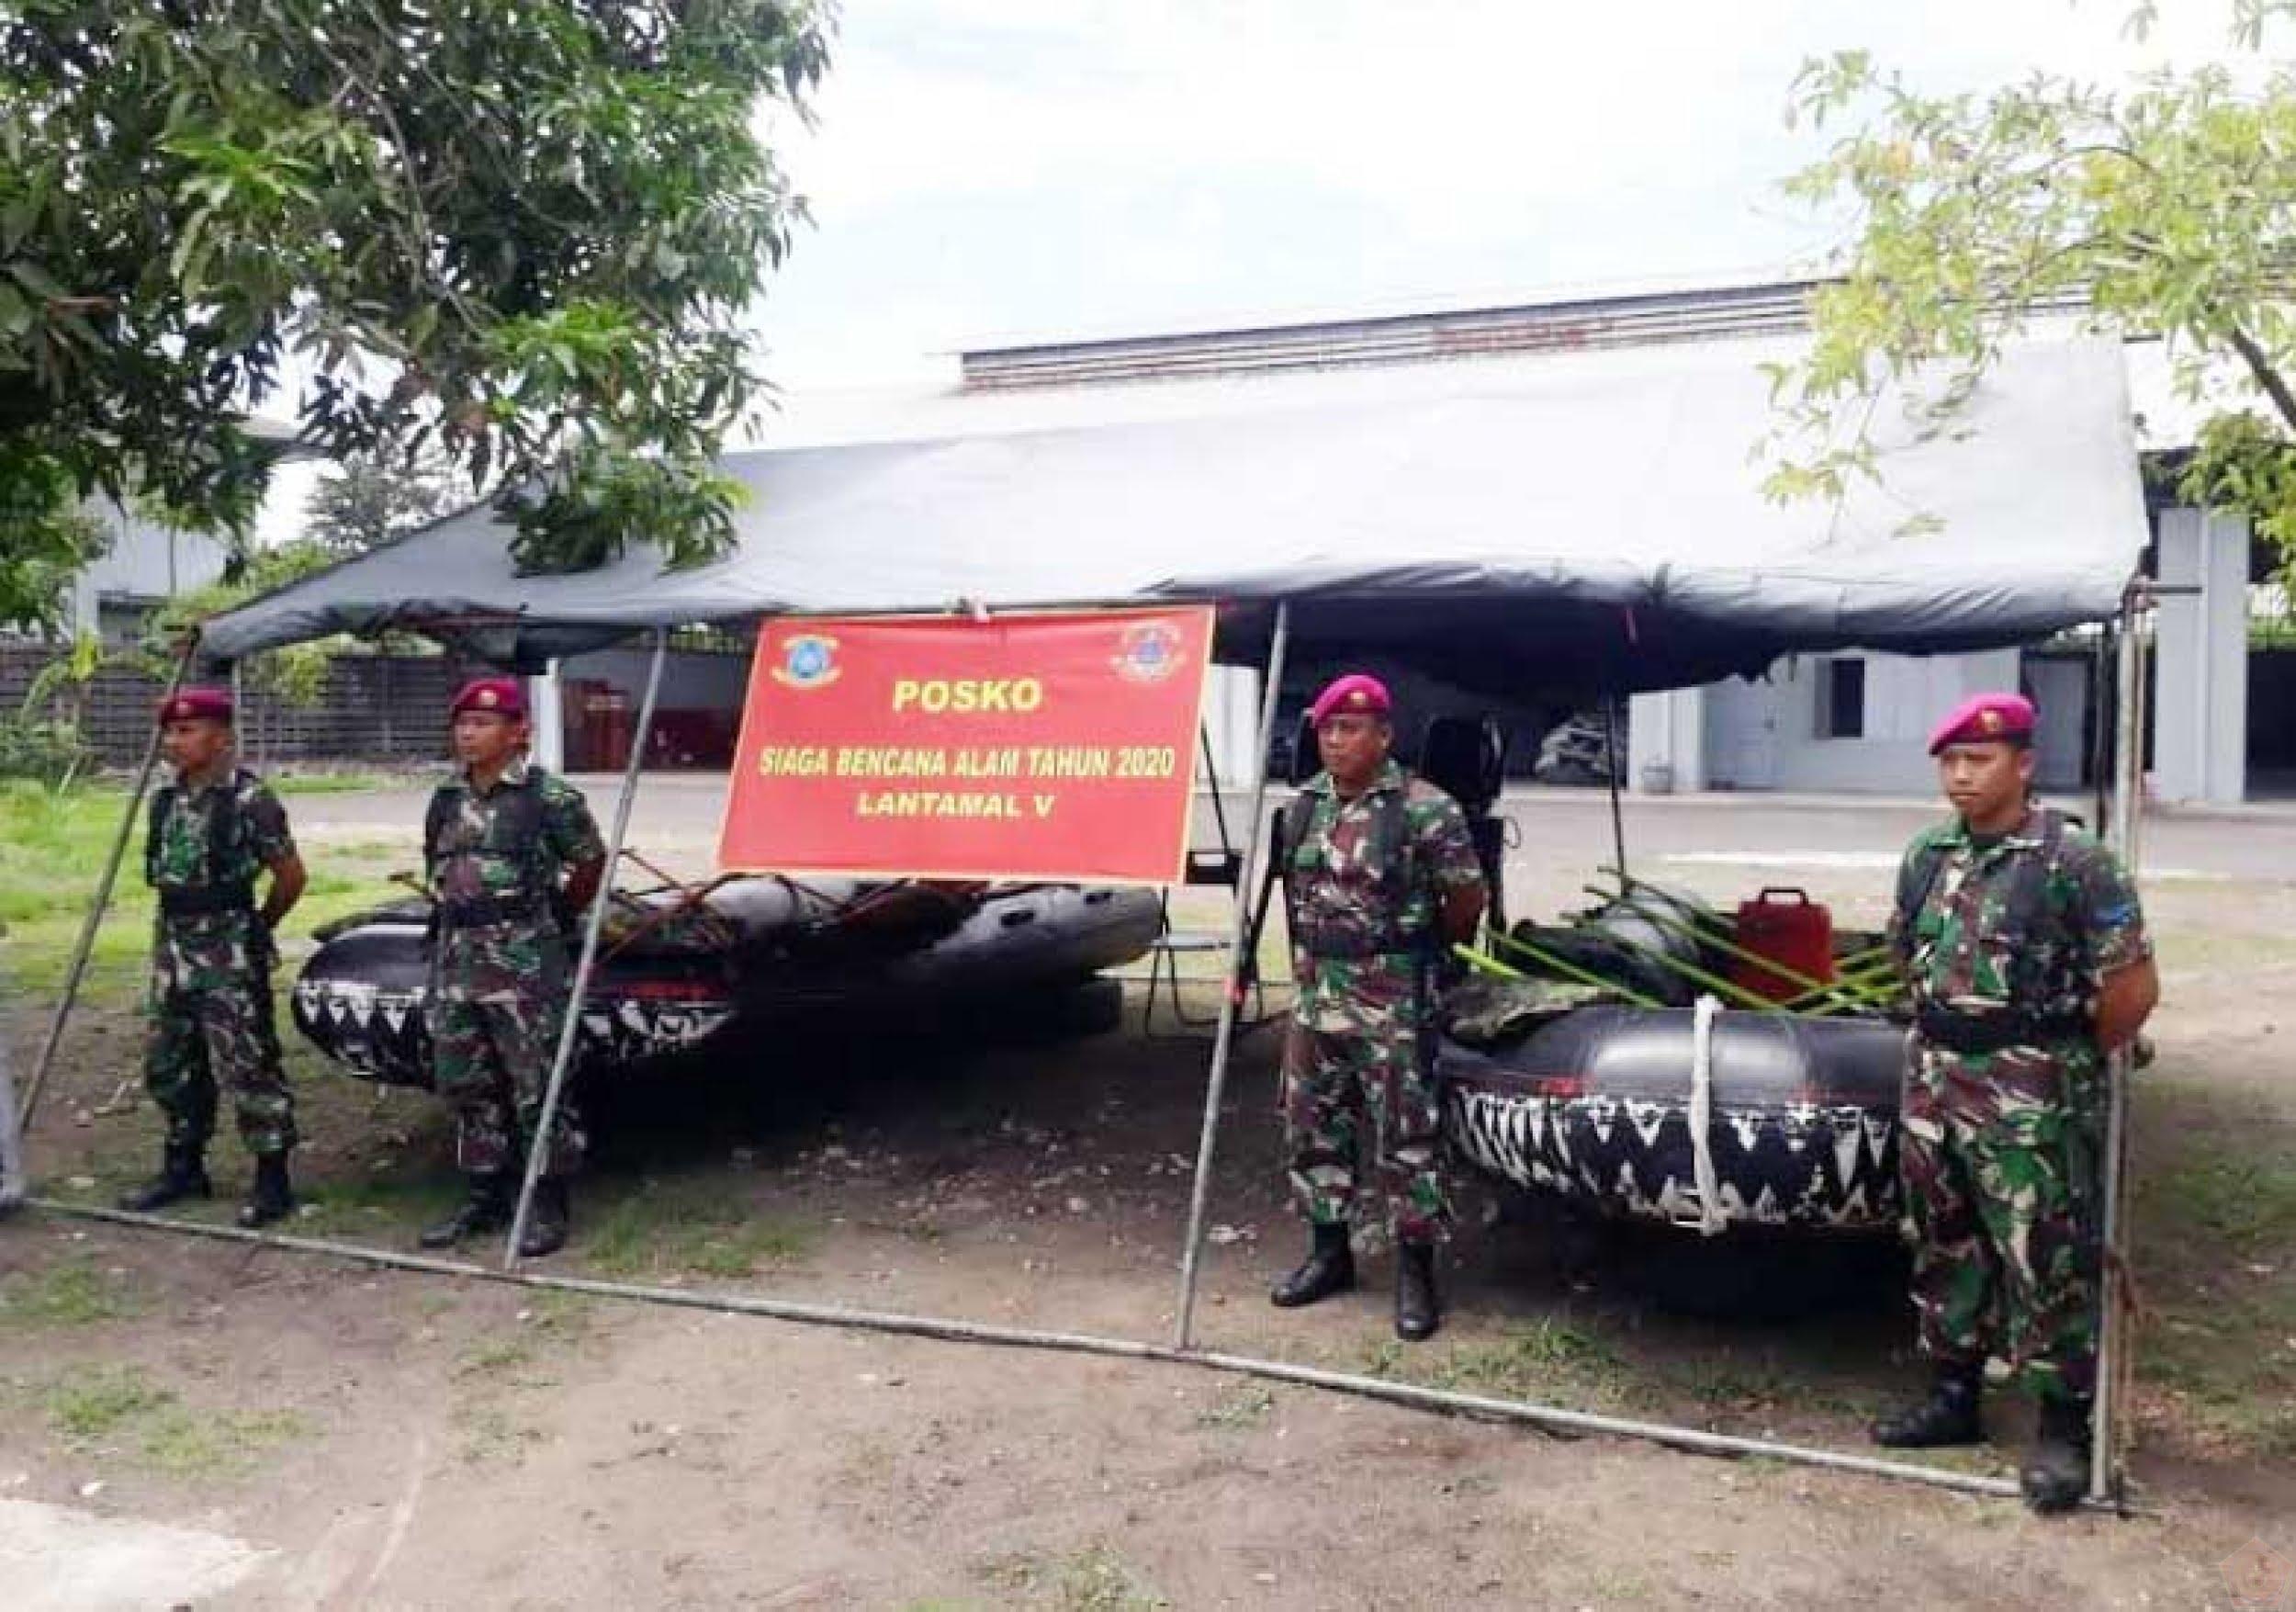 Yonmarhanlan V Surabaya Siapkan Paukan Satgas Becana Alam 113